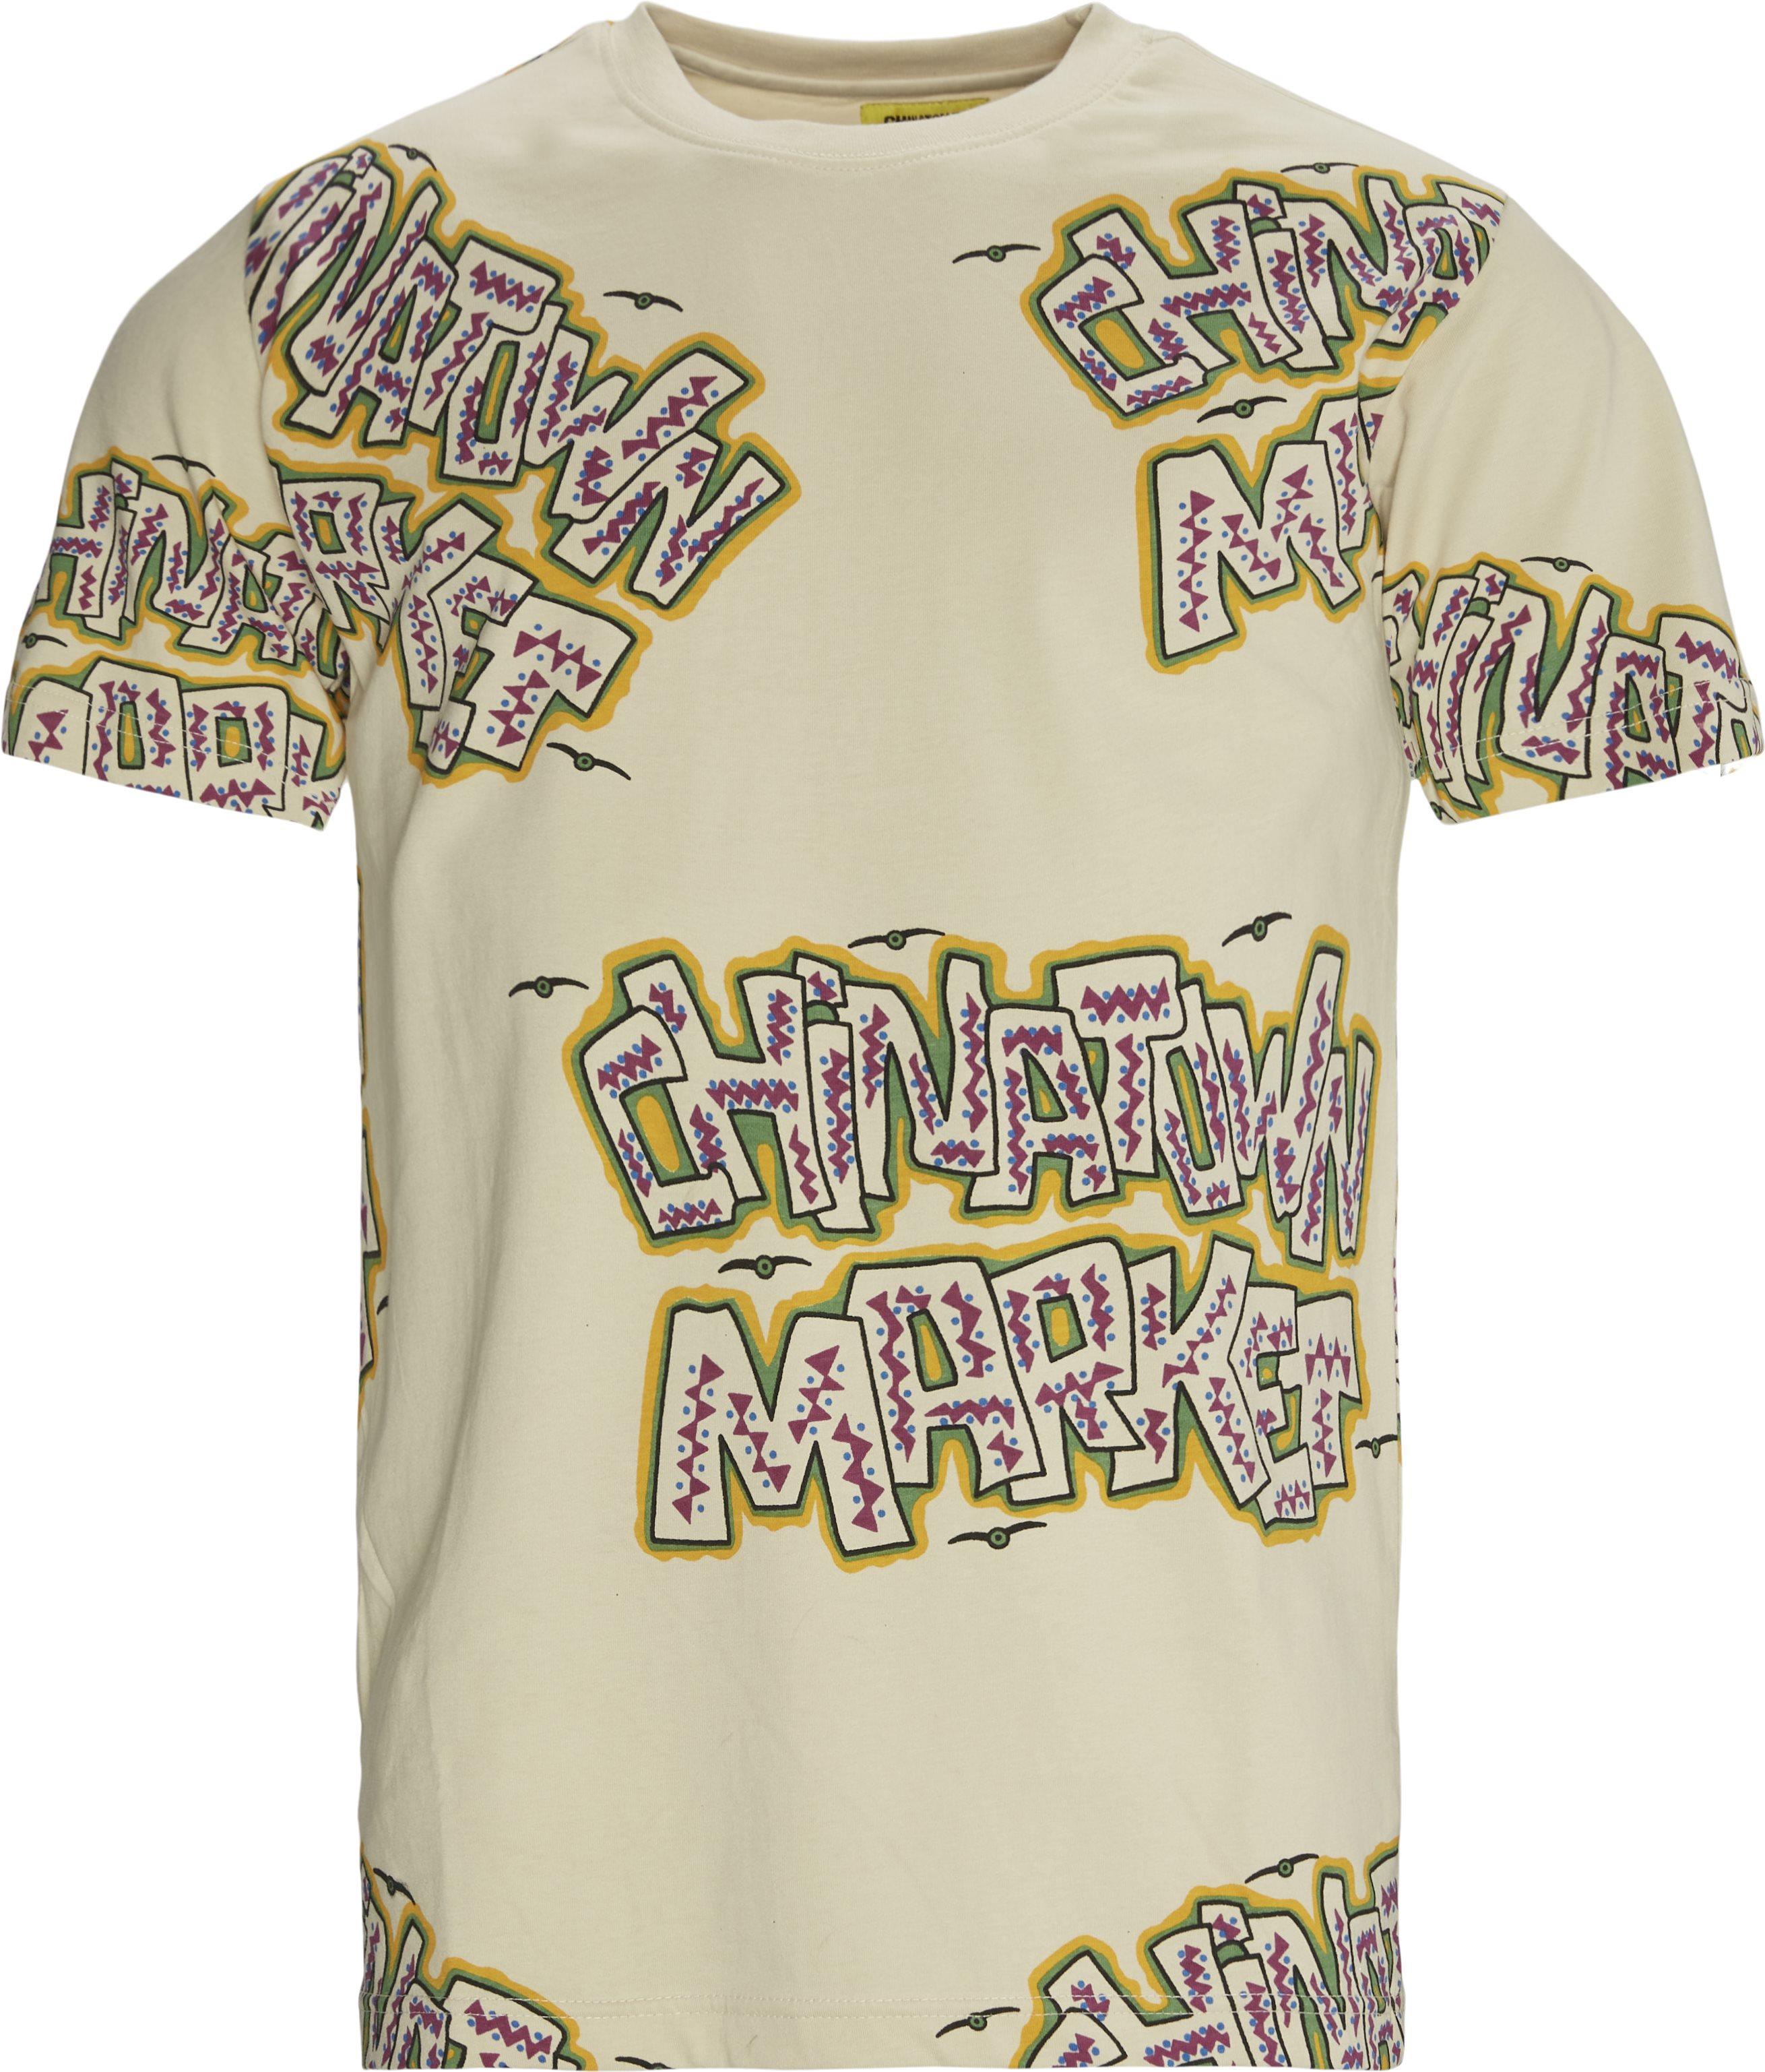 Creature Tee - T-shirts - Regular fit - Sand